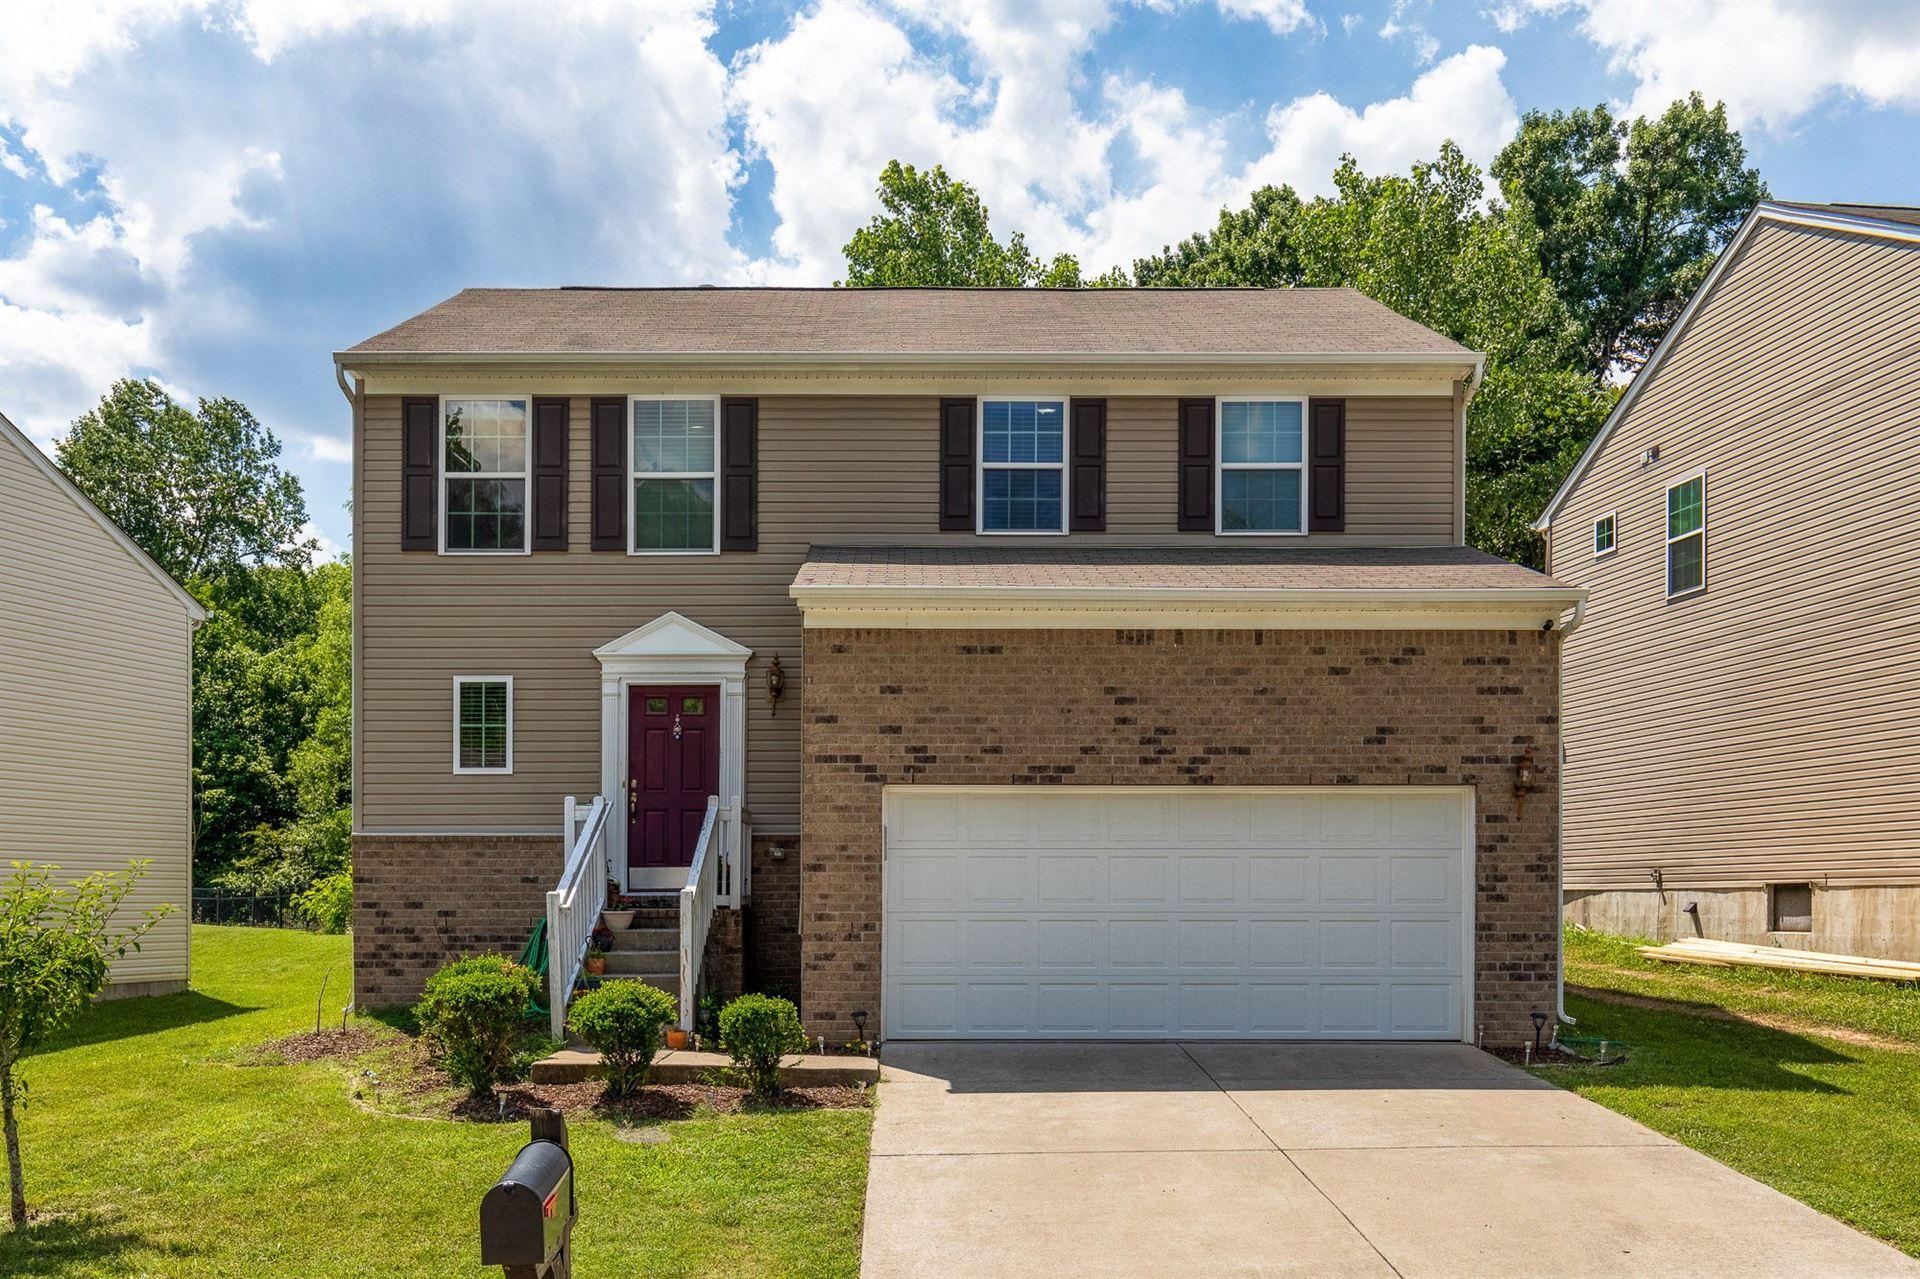 1836 Cottage Grove Way, Antioch, TN 37013 - MLS#: 2264166